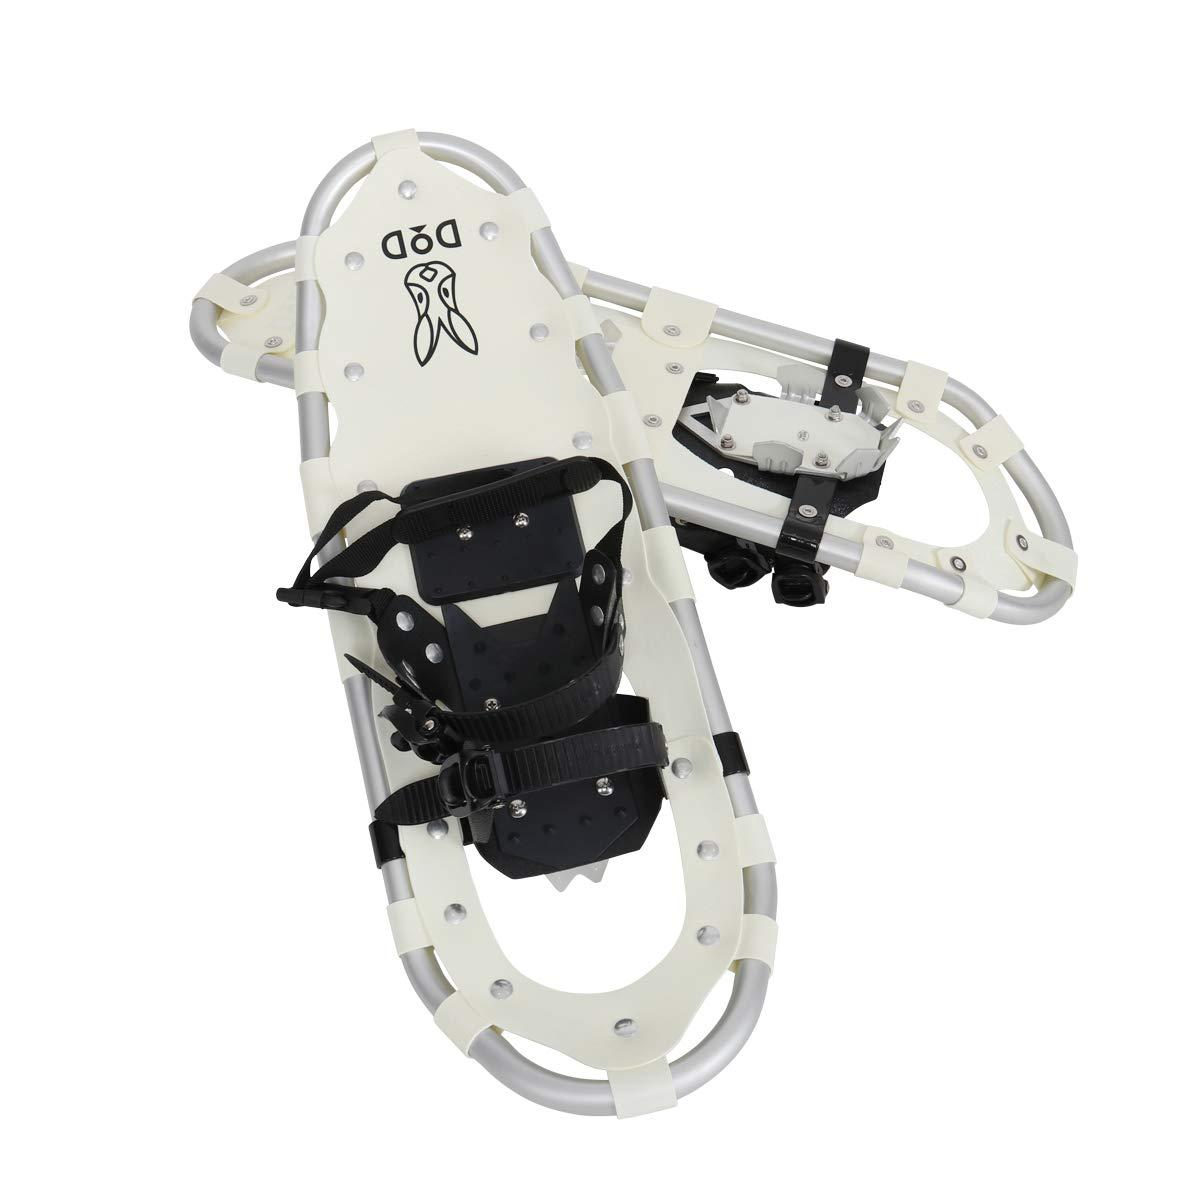 DOD(ディーオーディー) スノーシュー 軽量フレーム&簡単装着【初心者に最適】収納バッグ付き SW-30B【smtb-s】